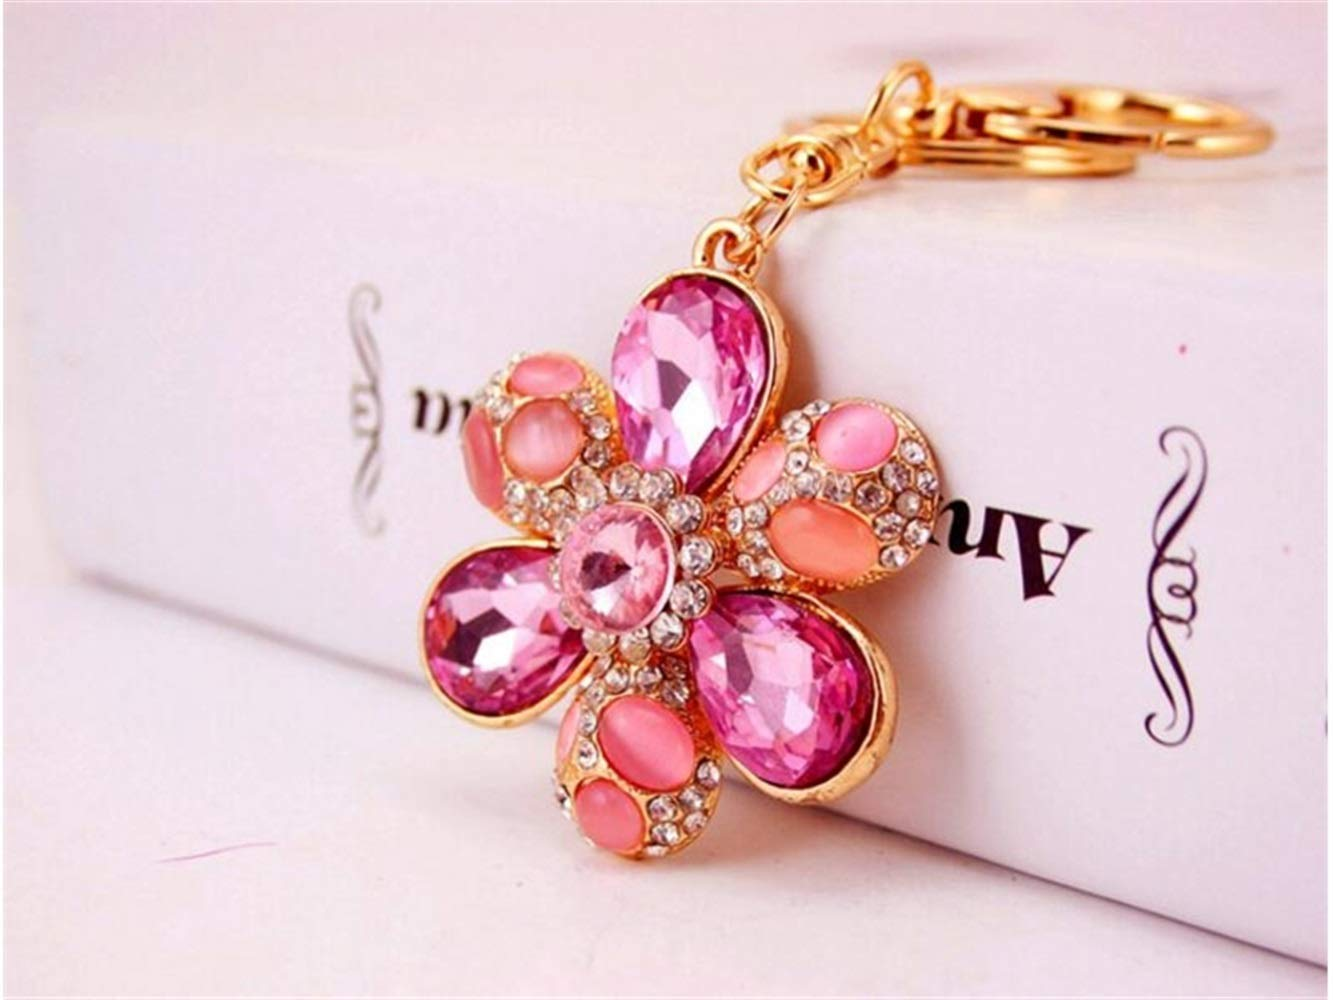 Gelaiken Novelty Diamond Opal Six-Petal Flower Keyring Crystal Keychain Charms Bag Purse Phone Pendant for Women Girls_Pink